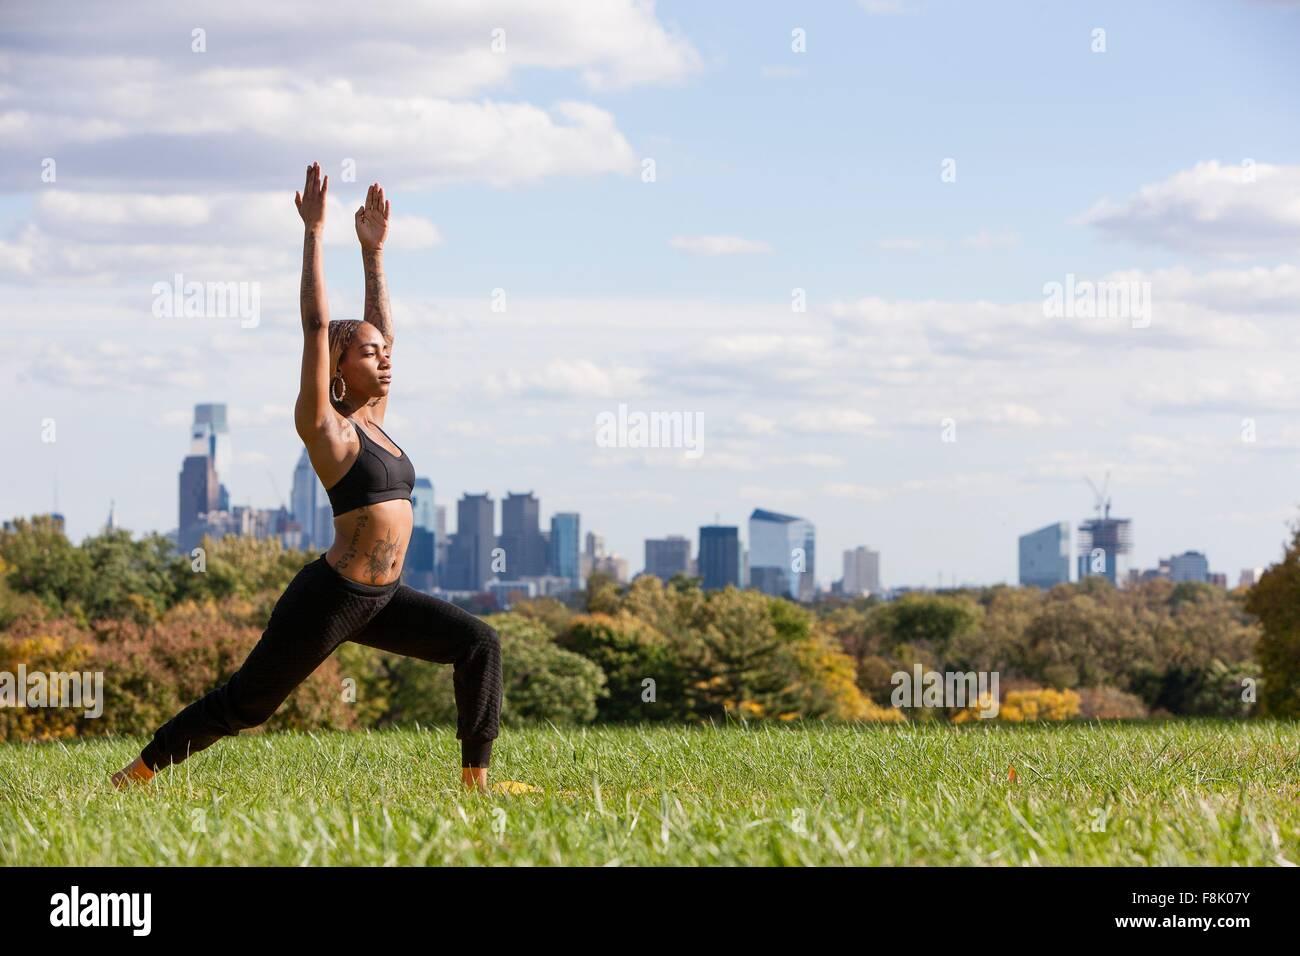 Seitenansicht der jungen Frau auf dem Rasen in Yogaposition, Arme angehoben, Augen geschlossen, Philadelphia, Pennsylvania, Stockbild